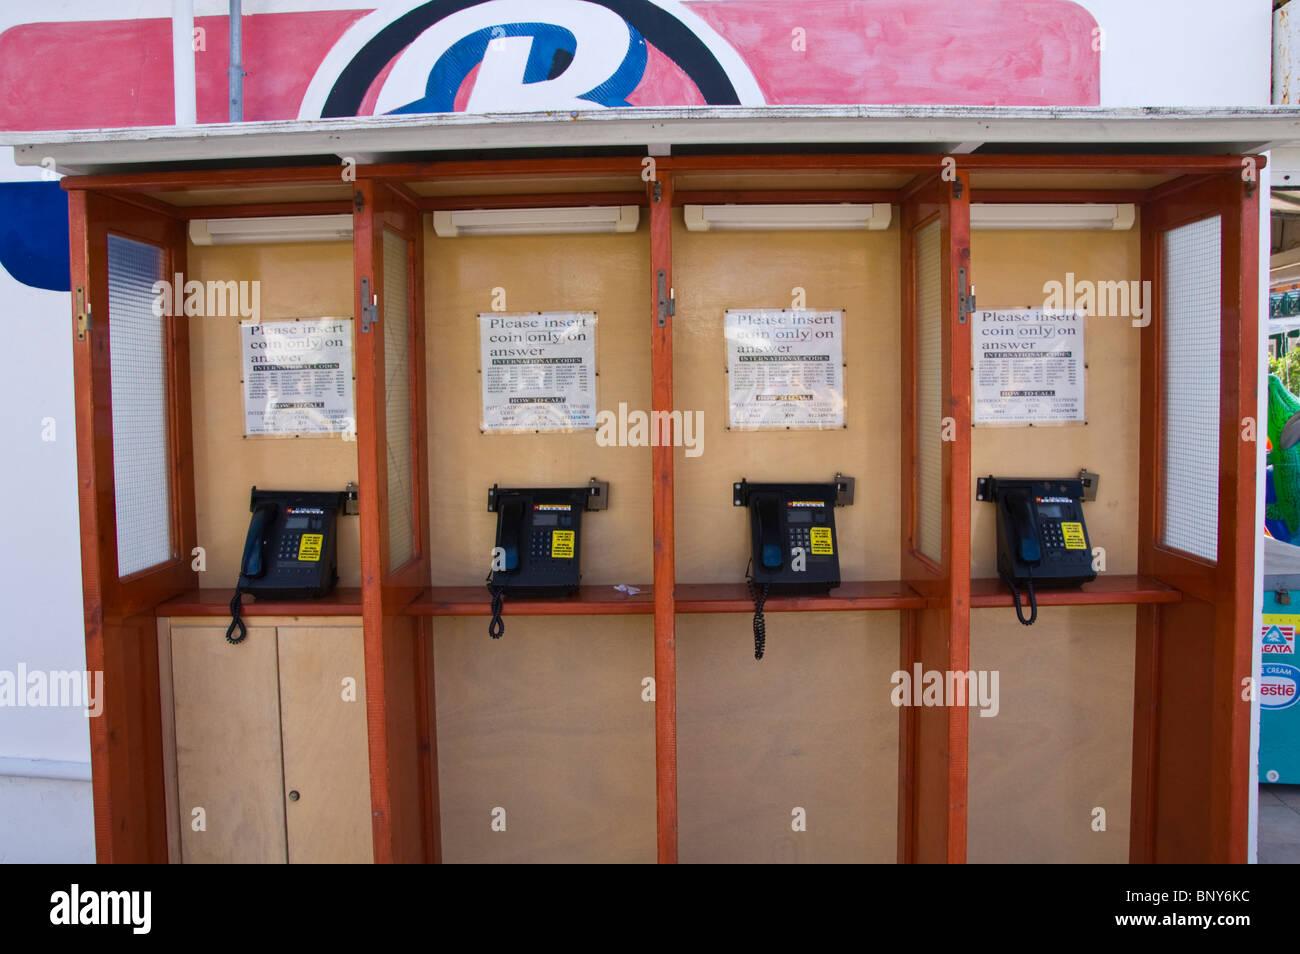 Public telephones in Sidari on the Greek island of Corfu Greece GR - Stock Image